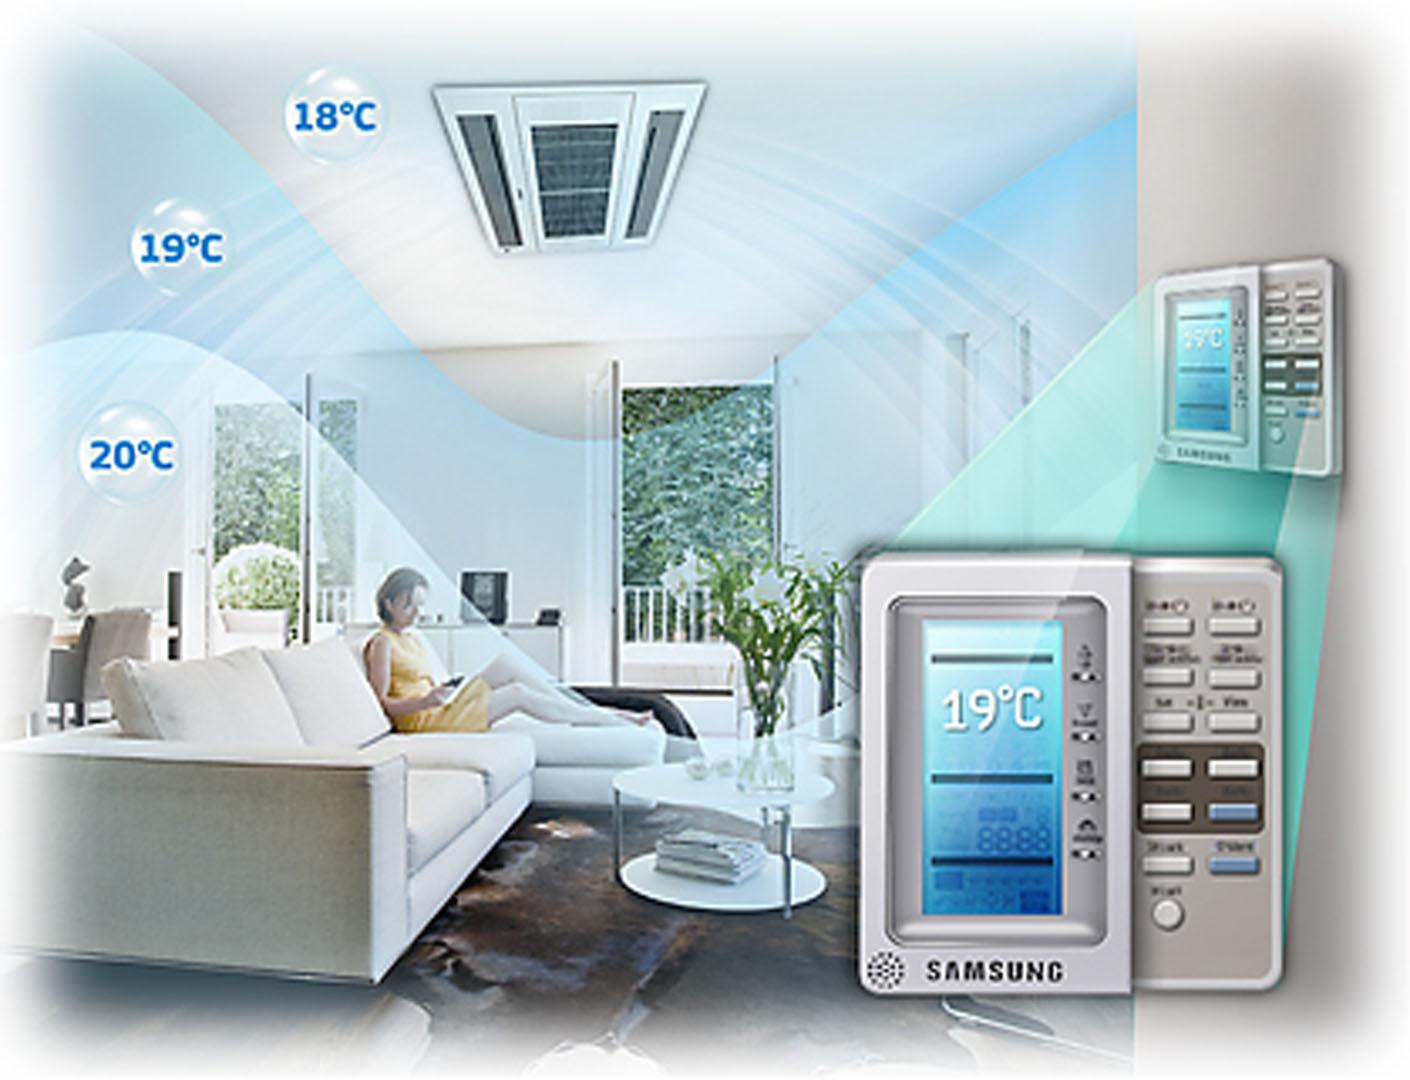 Samsung 2-weg cassette warmtepomp airco in woning